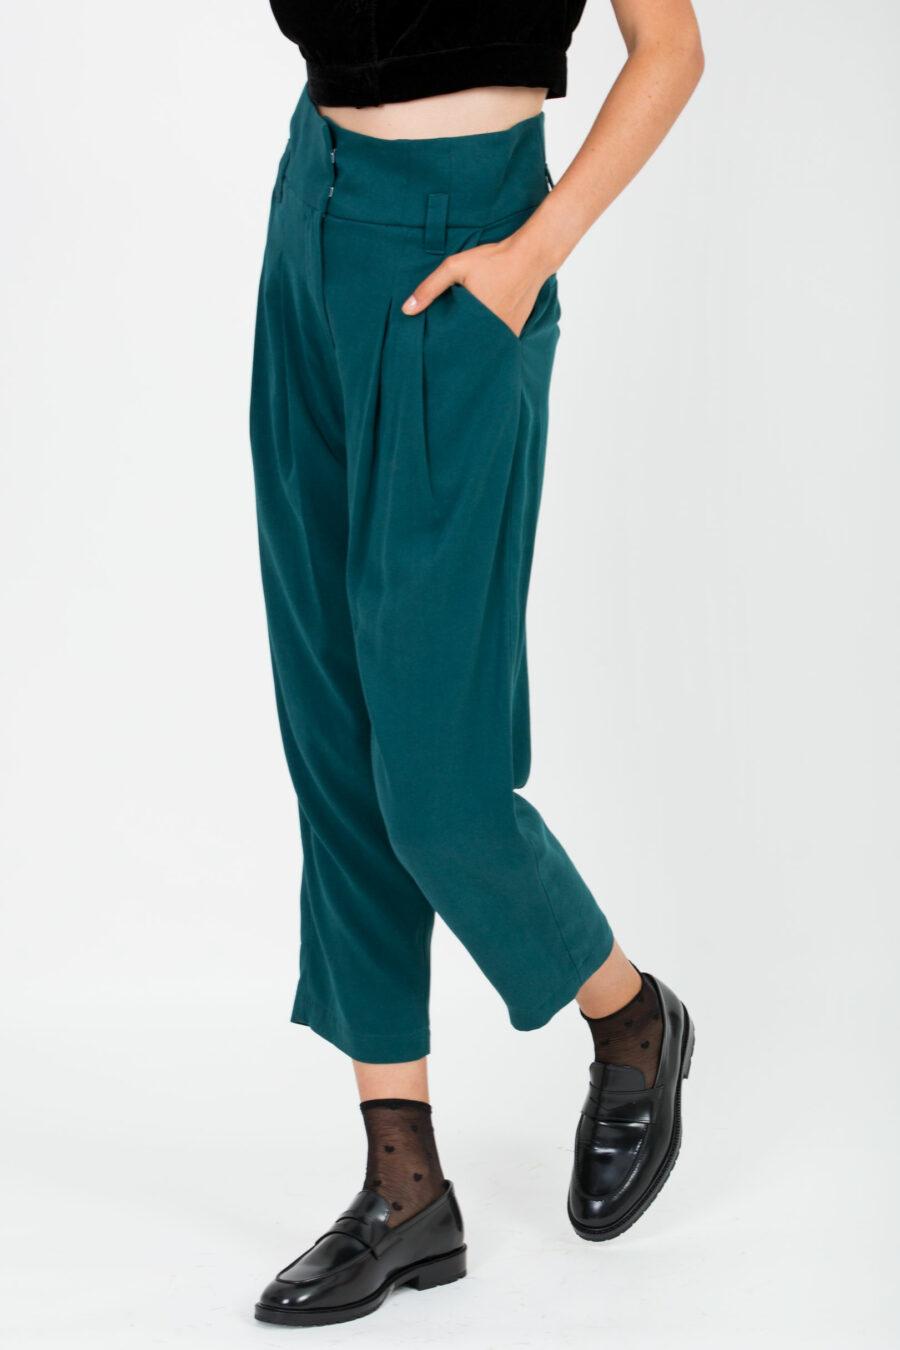 Margot Petrol Green Trousers